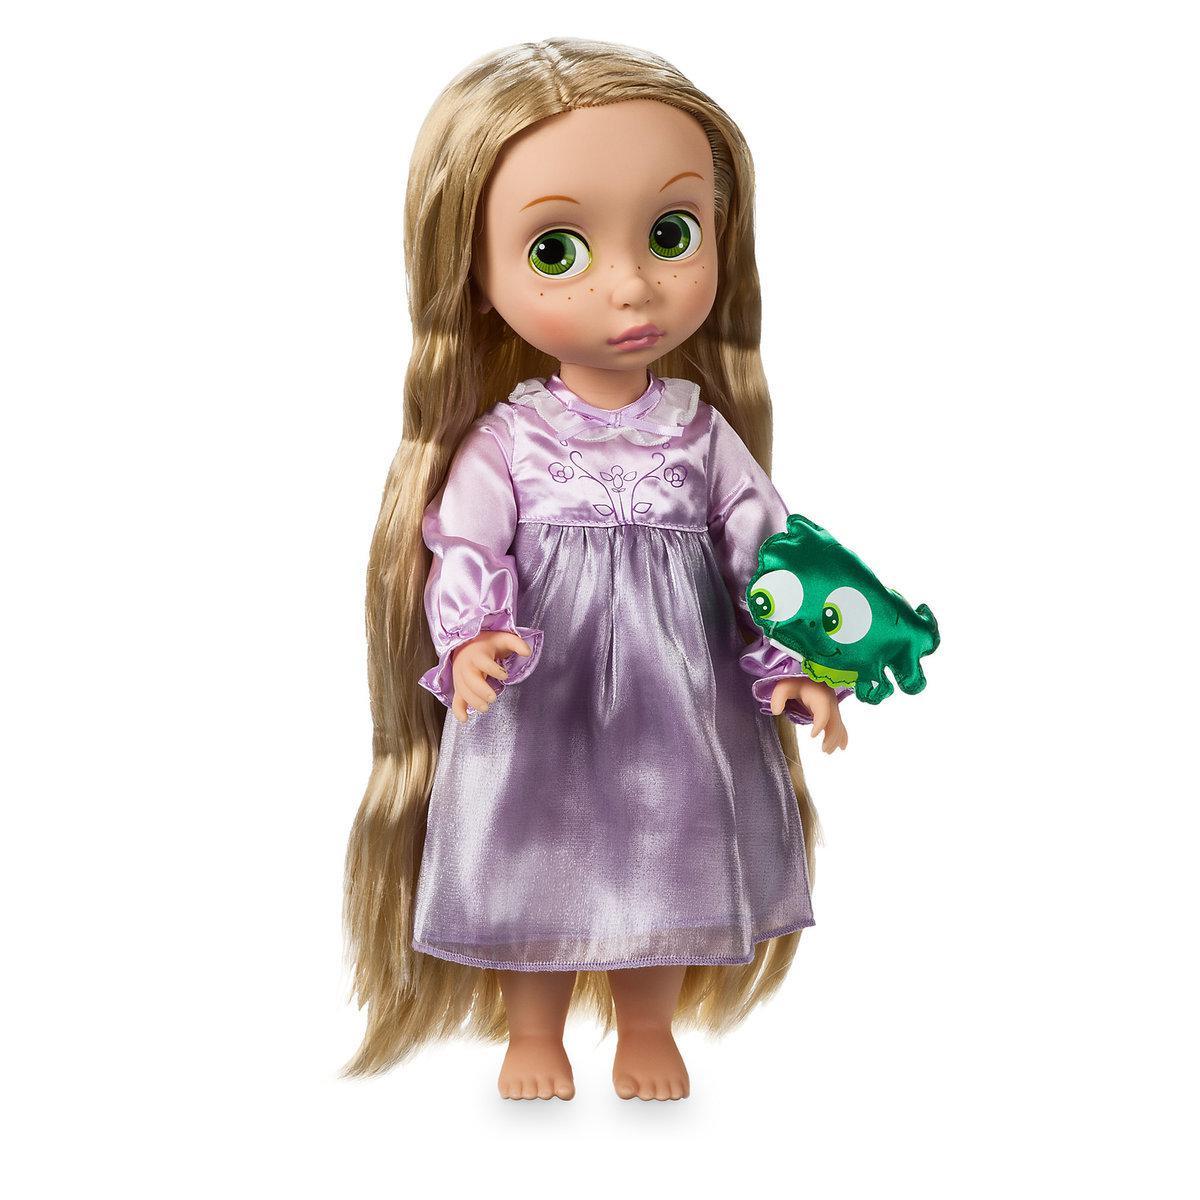 Disney Animators Дисней Аниматор Кукла принцесса малышка Рапунцель